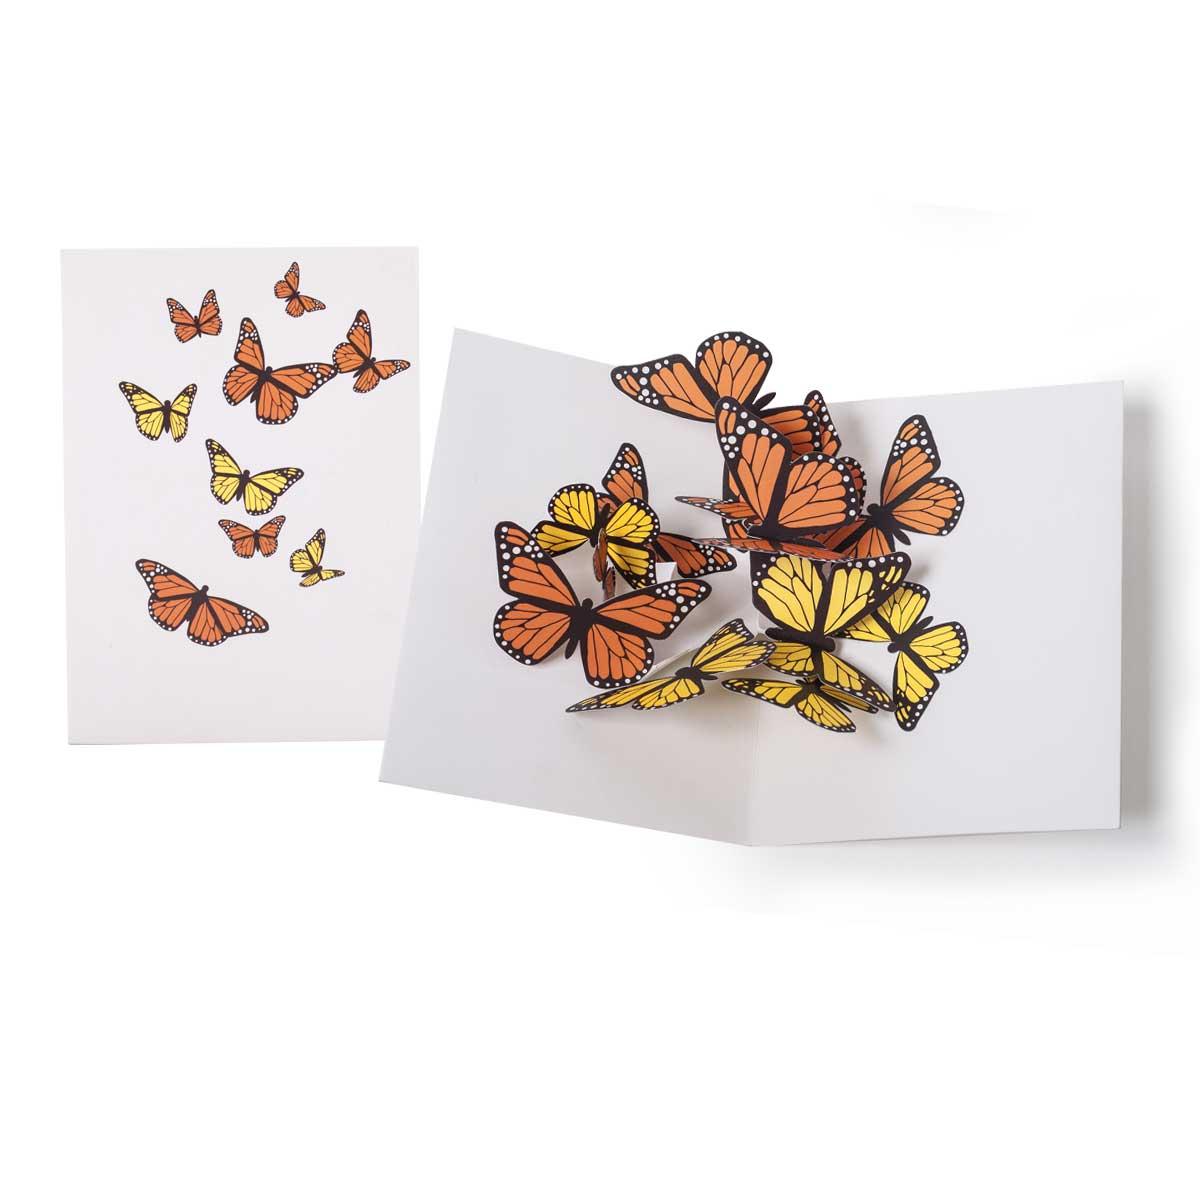 MoMA-FlutteringButterflies_Maike-Biederstaedt.jpg